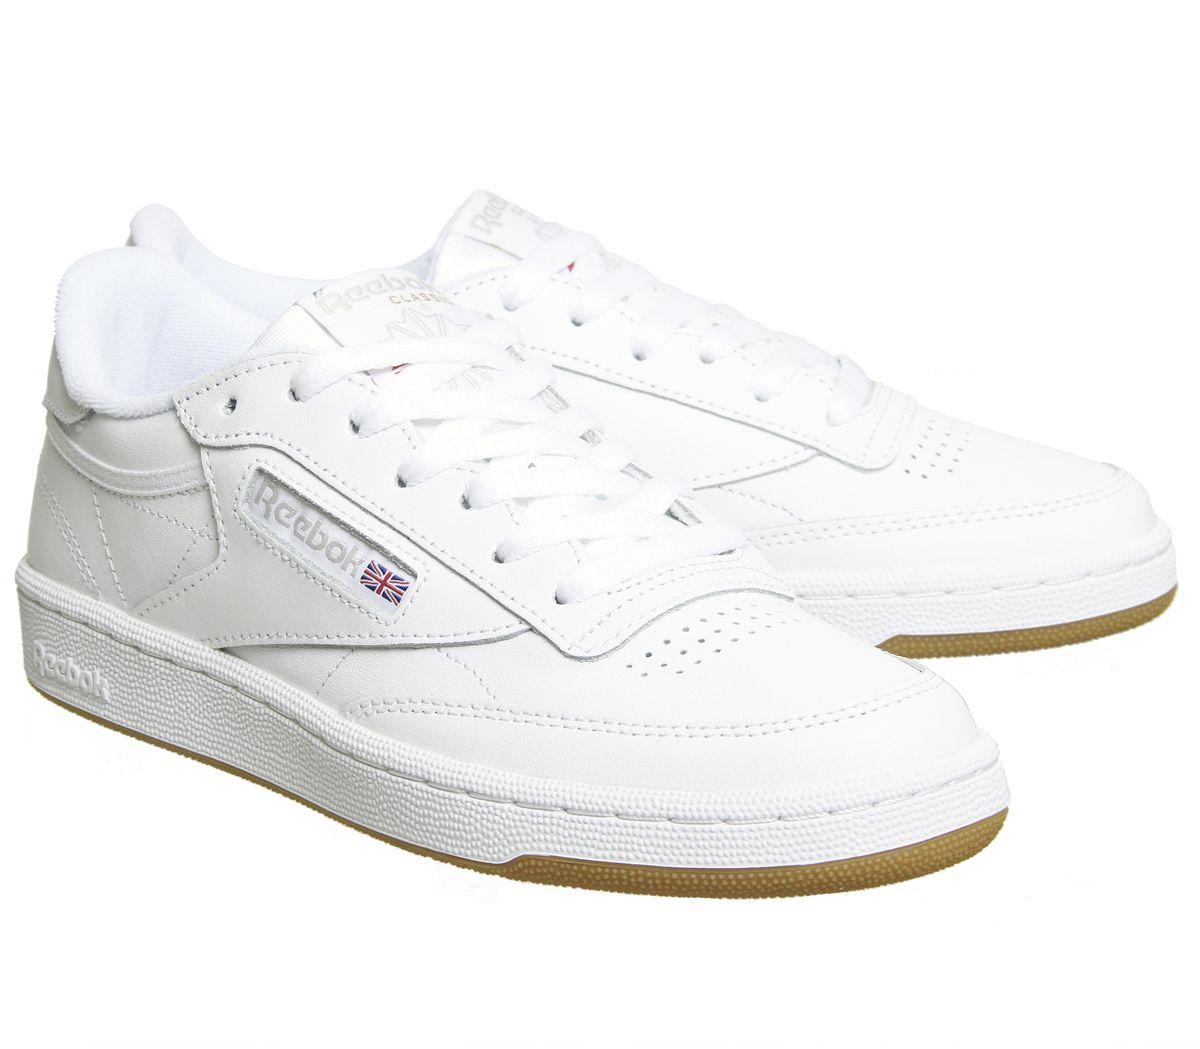 a12dc9b44fc Womens Reebok Club C 85 Trainers White Grey Gum Trainers Shoes